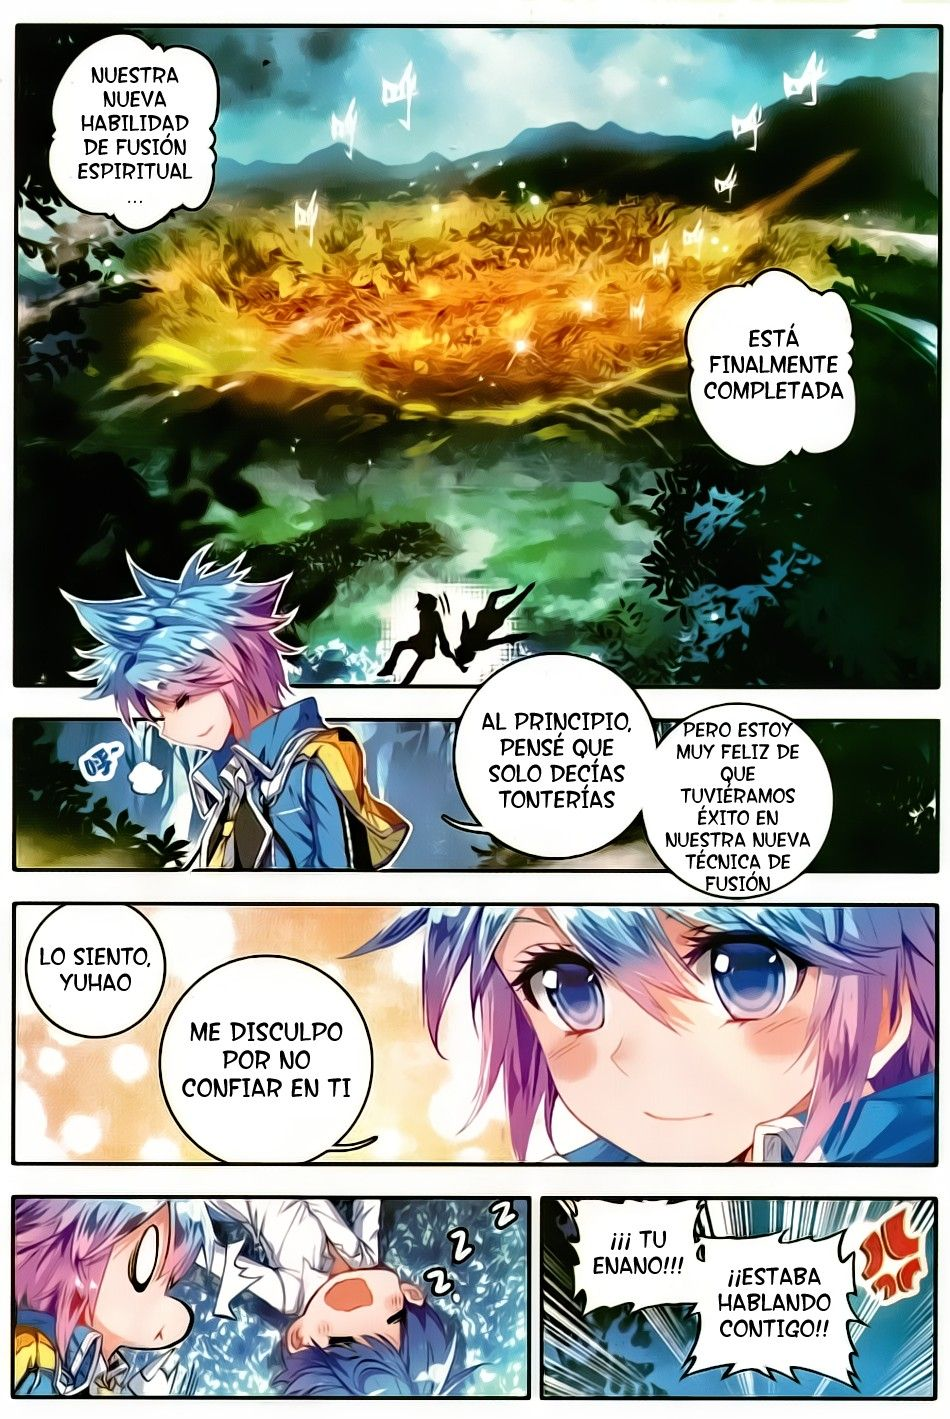 http://c5.ninemanga.com/es_manga/pic2/33/16417/511290/e36d6304f09fa1673f3477b4b01eb4c9.jpg Page 3